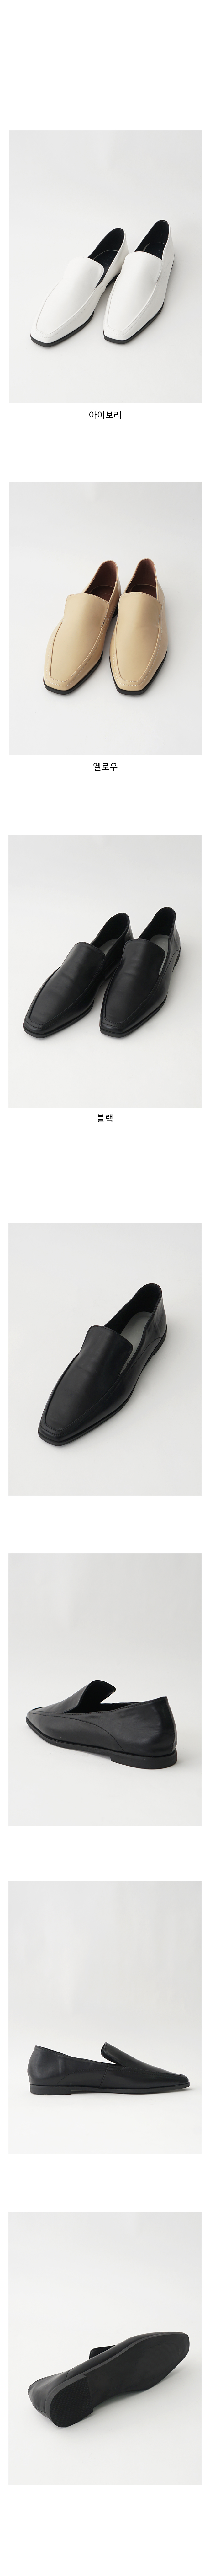 slim and sharp loafer